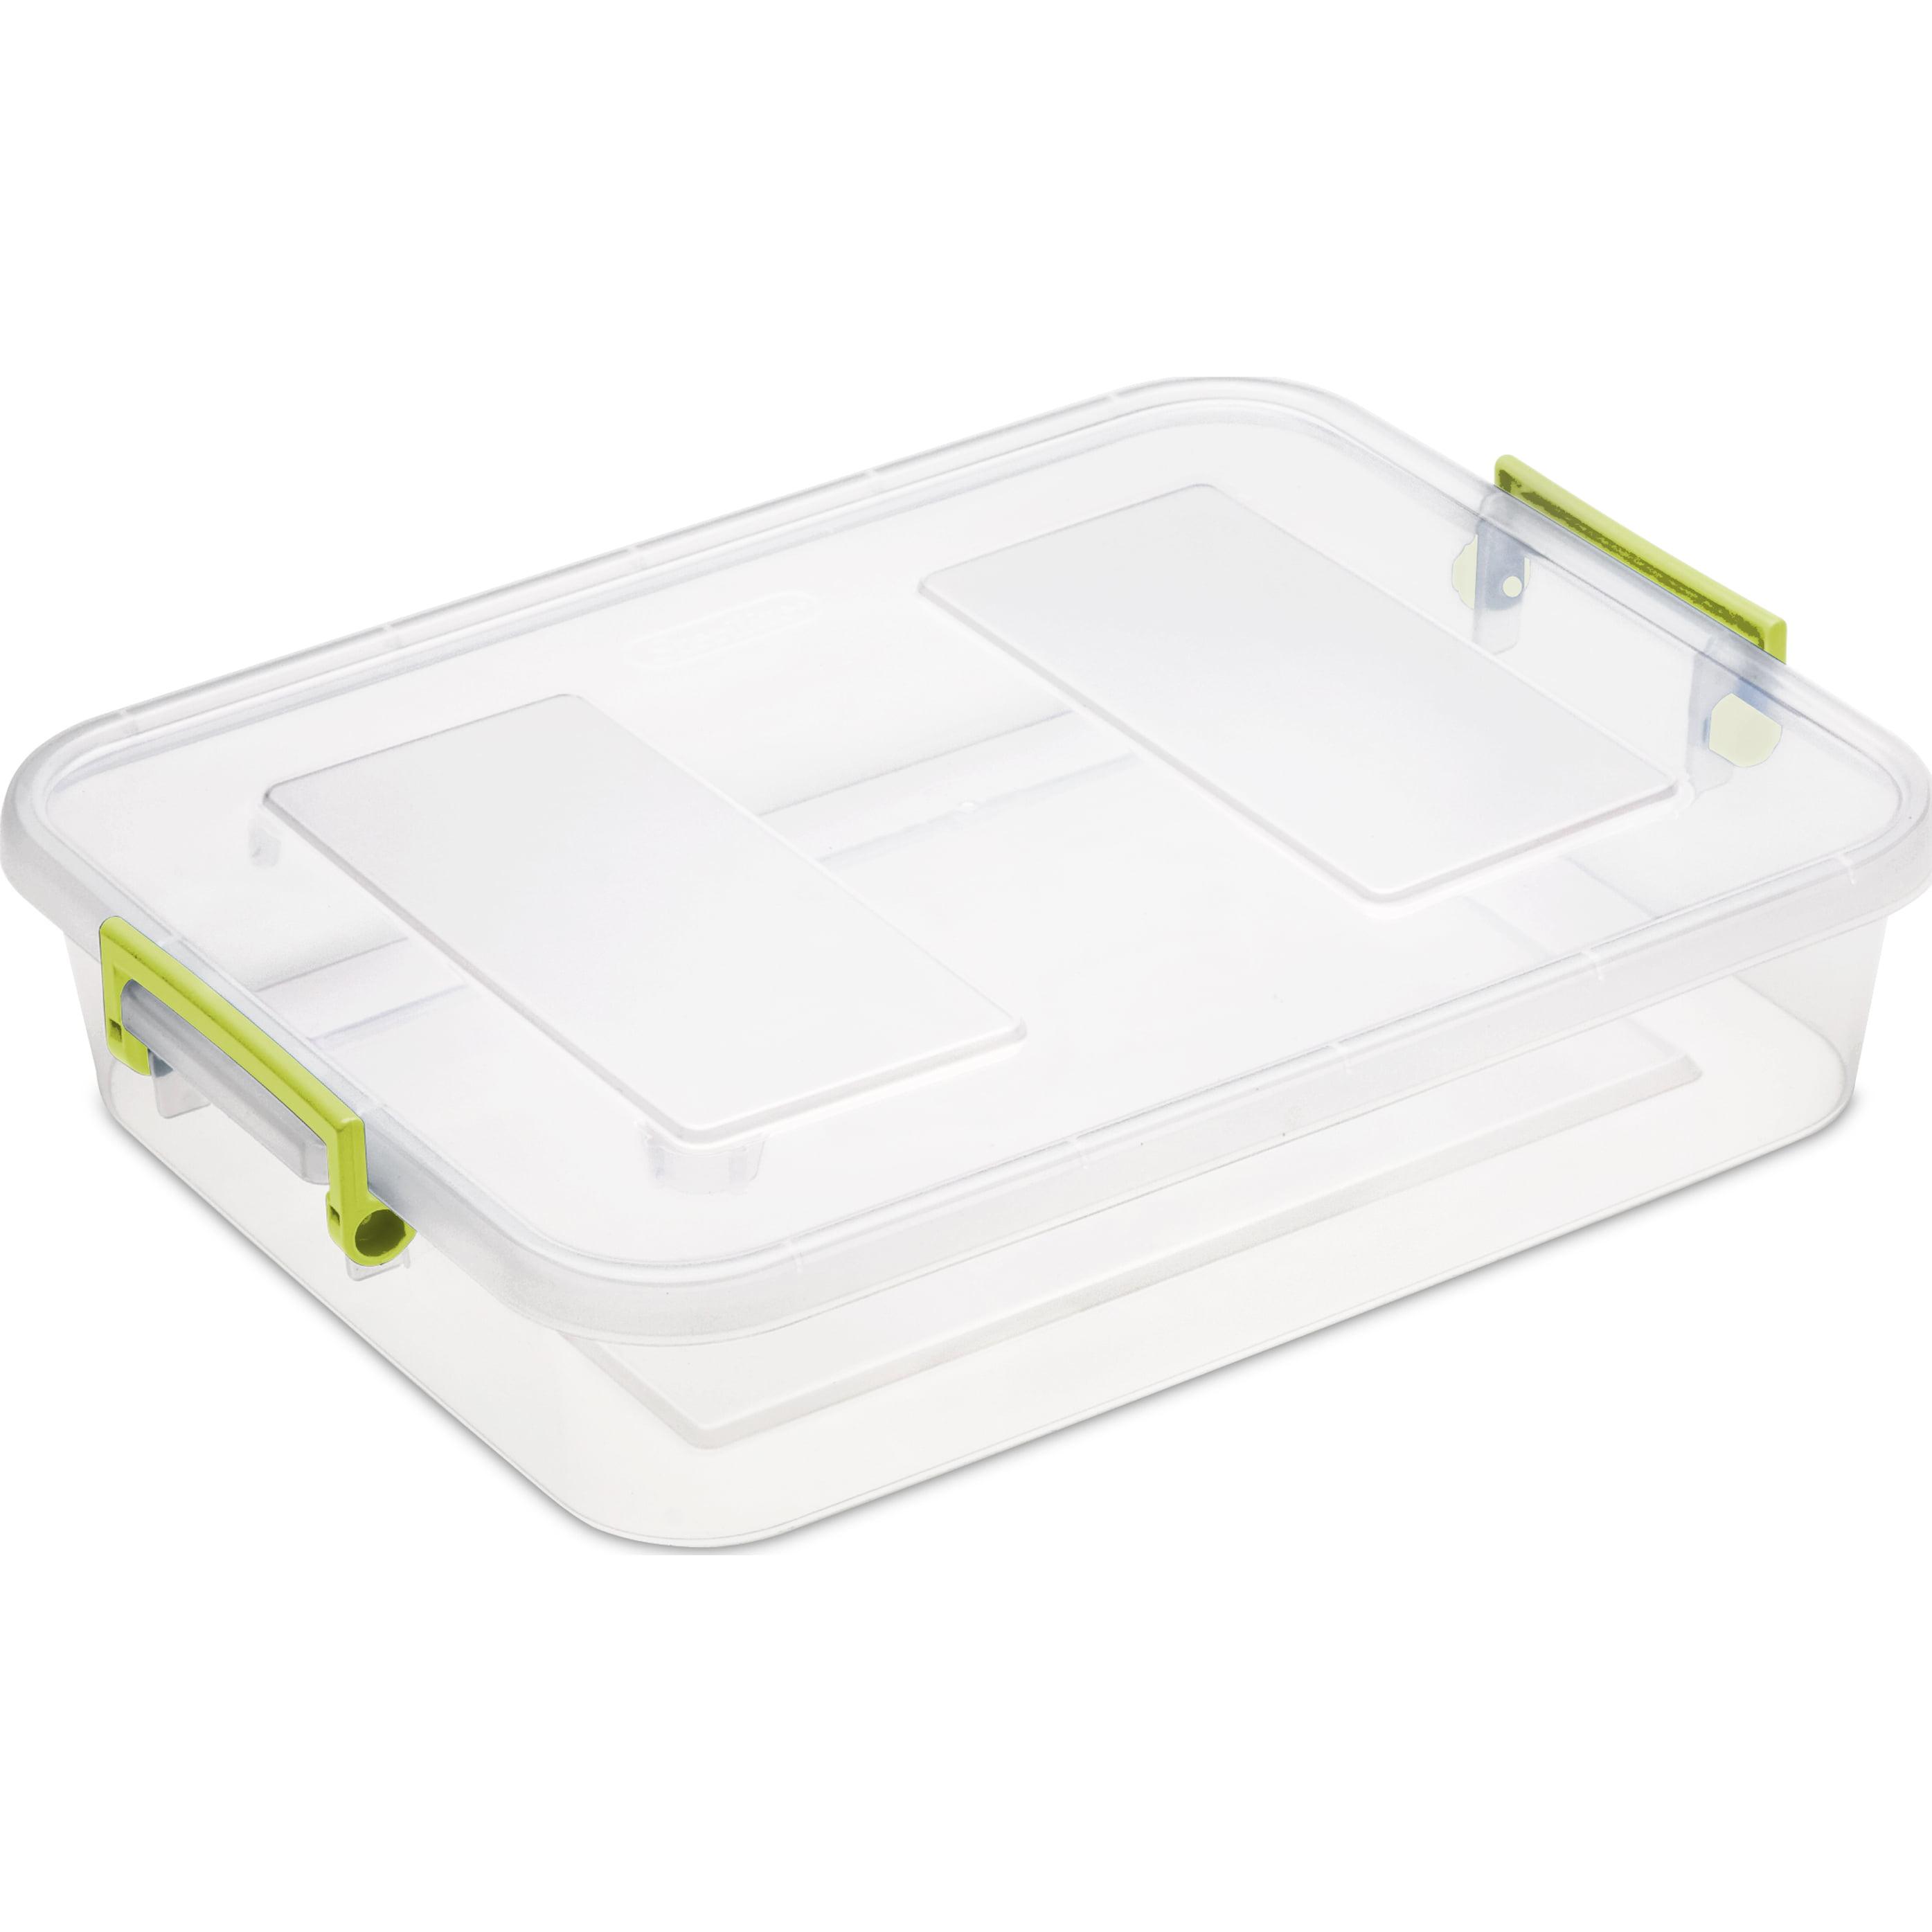 Sterilite 6.2 Qt Modular Latching Box, Bamboo